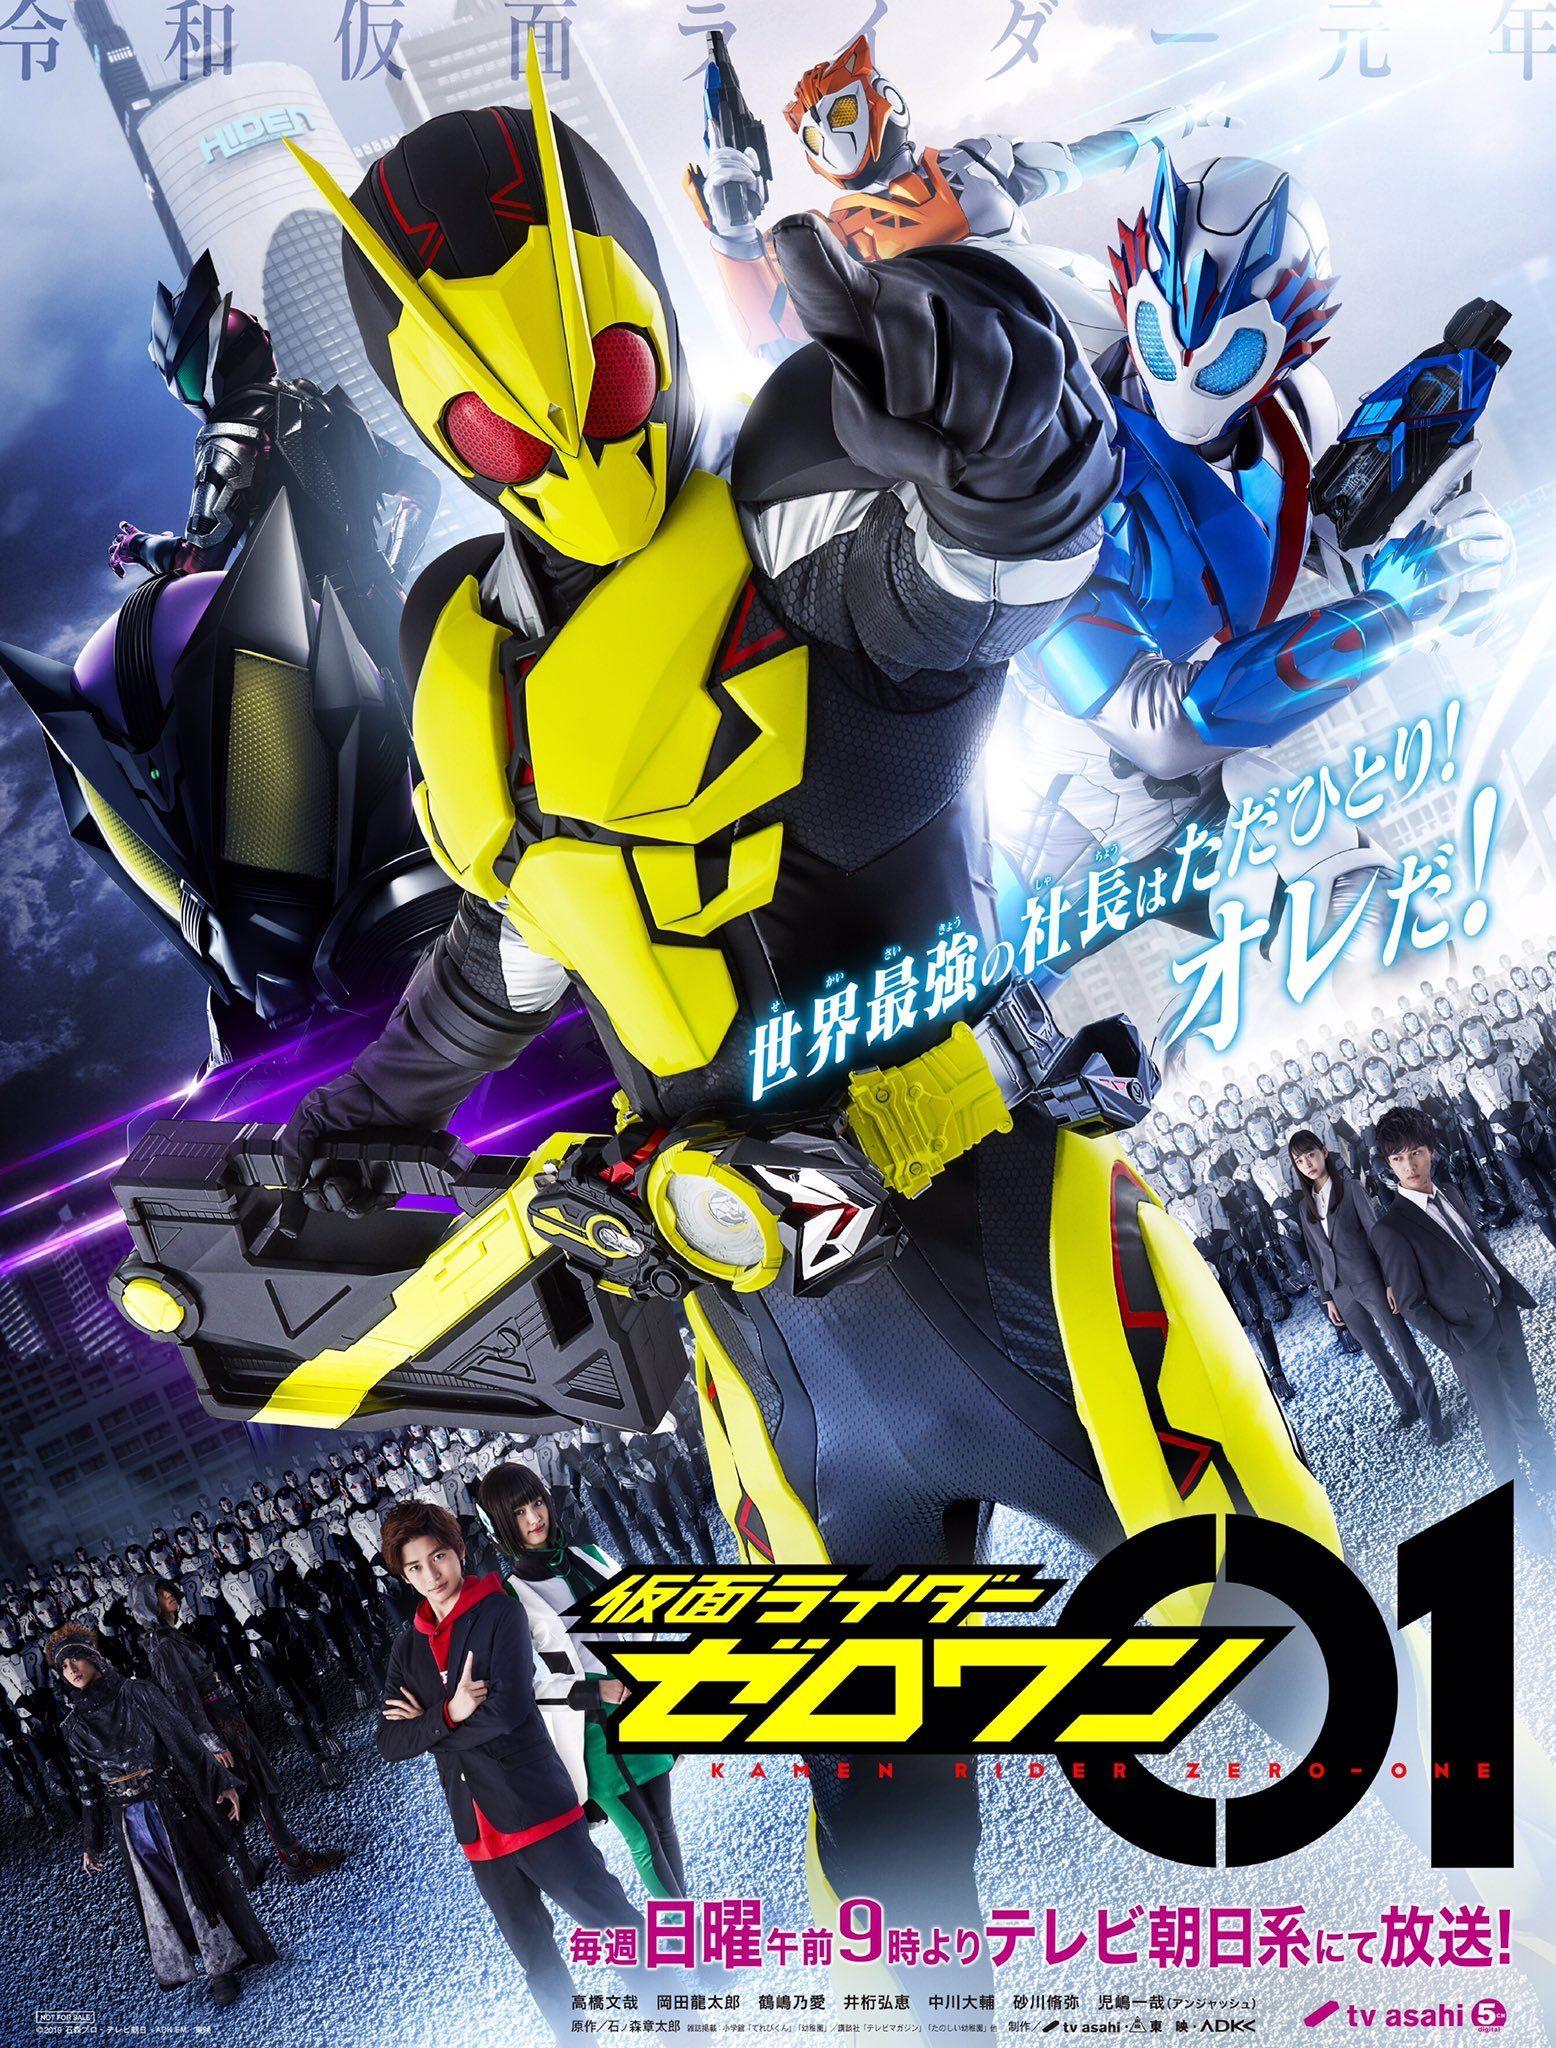 kamen rider zero one おしゃれまとめの人気アイデア pinterest b t 7 9 仮面ライダー 特撮ヒーロー 仮面 ライダー滅